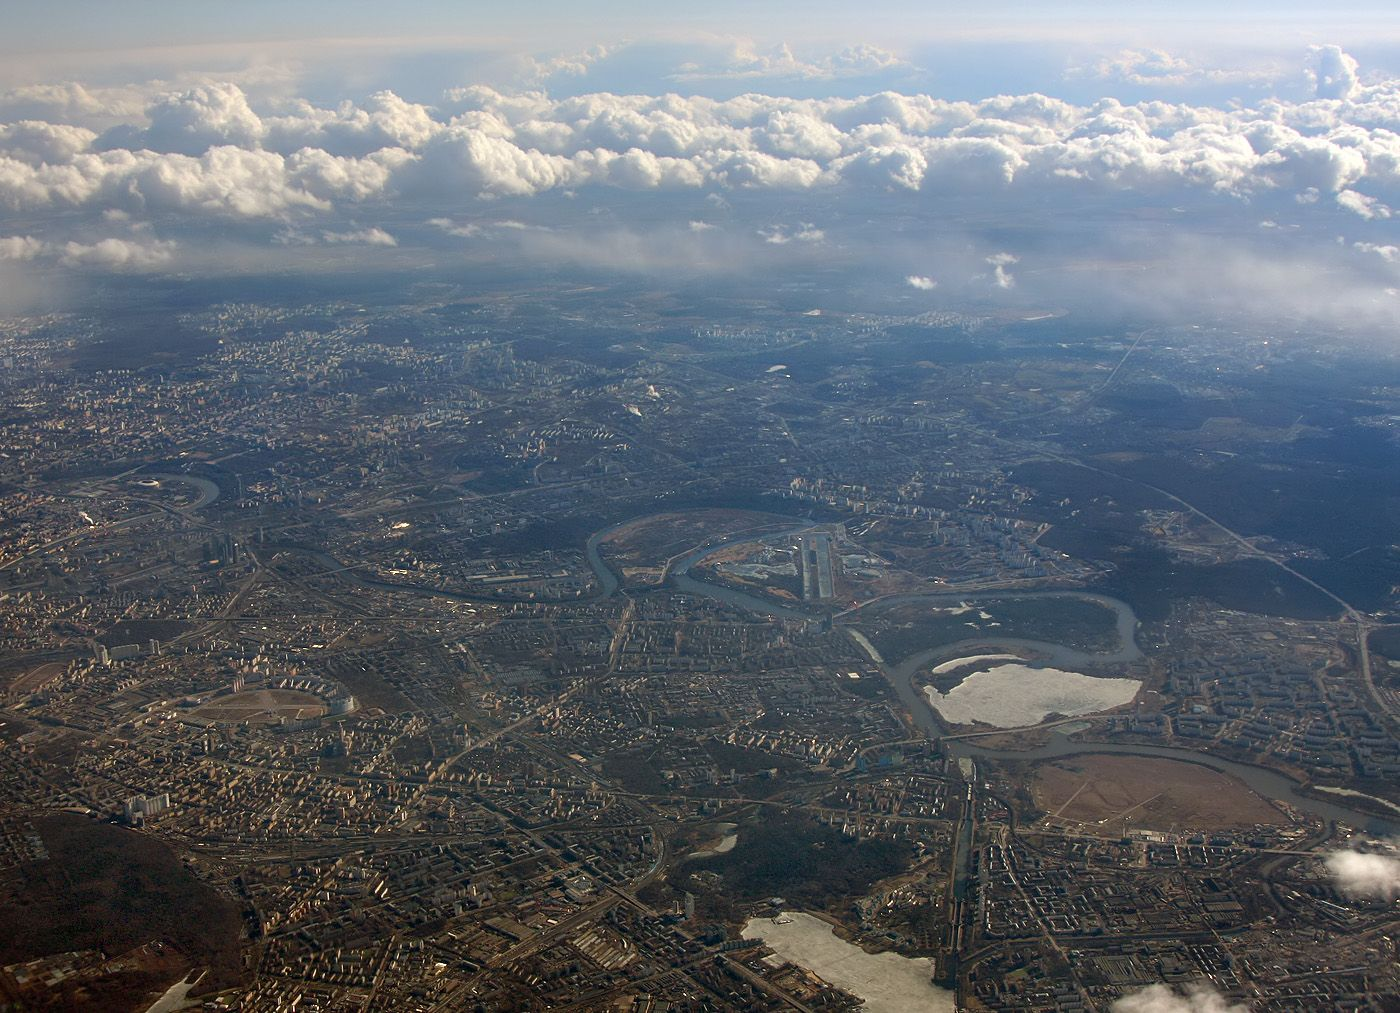 MOW-Khodynka-Tushino-1400.jpg